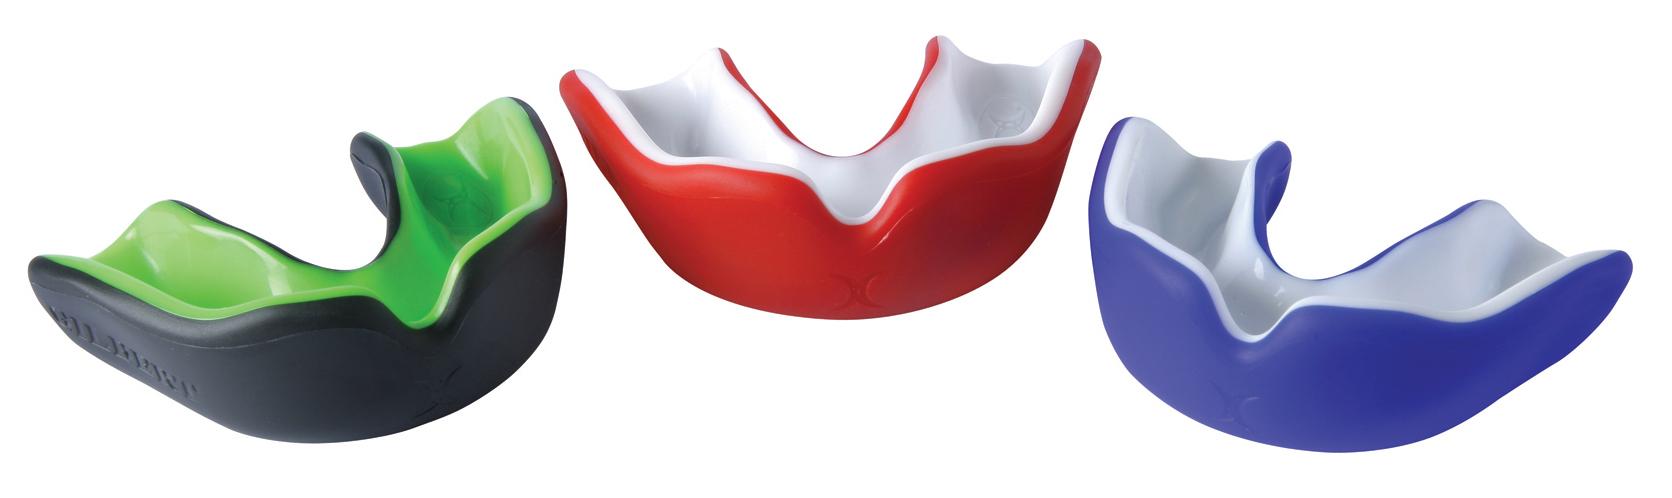 Prot ge dent virtuo dual density noir vert rouge blanc bleu blanc - Brosse a dent bleu blanc rouge ...